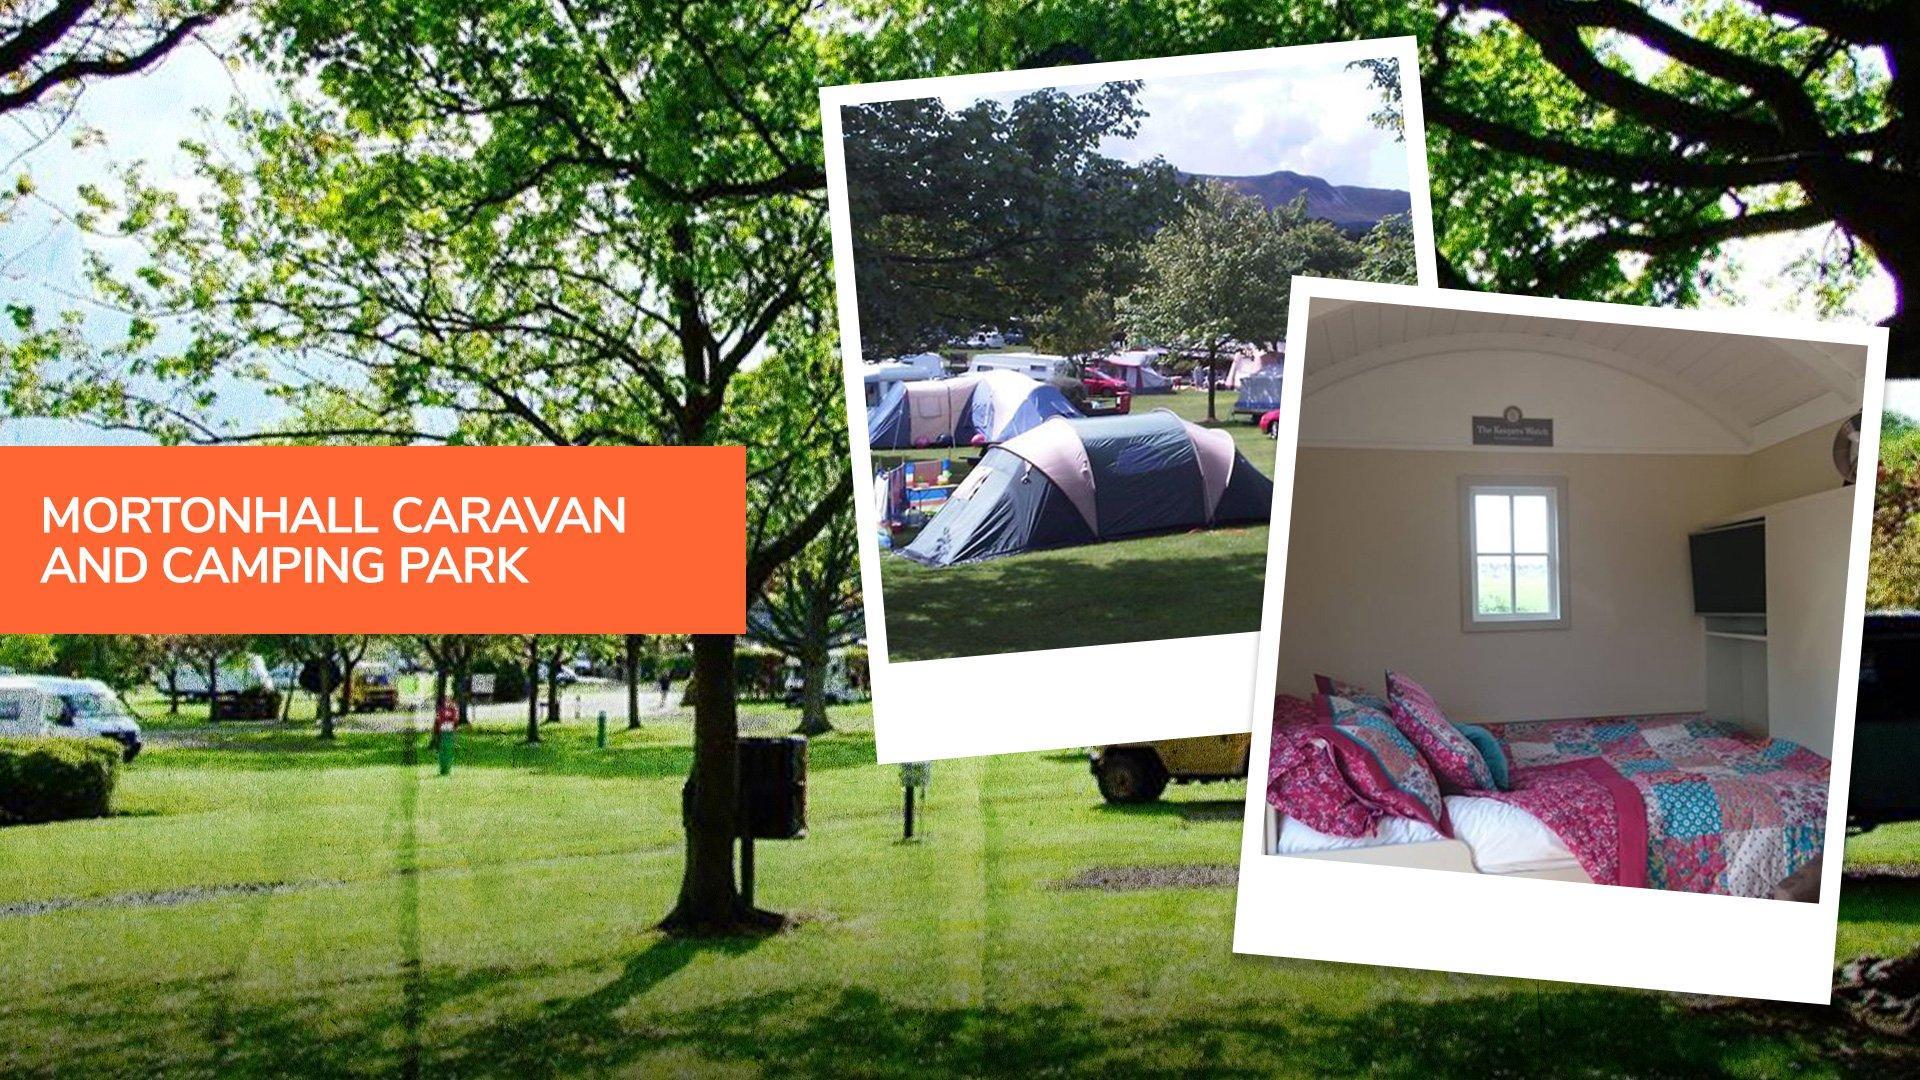 Mortonhall caravan and camping park, one of the top campsites near Edinburgh